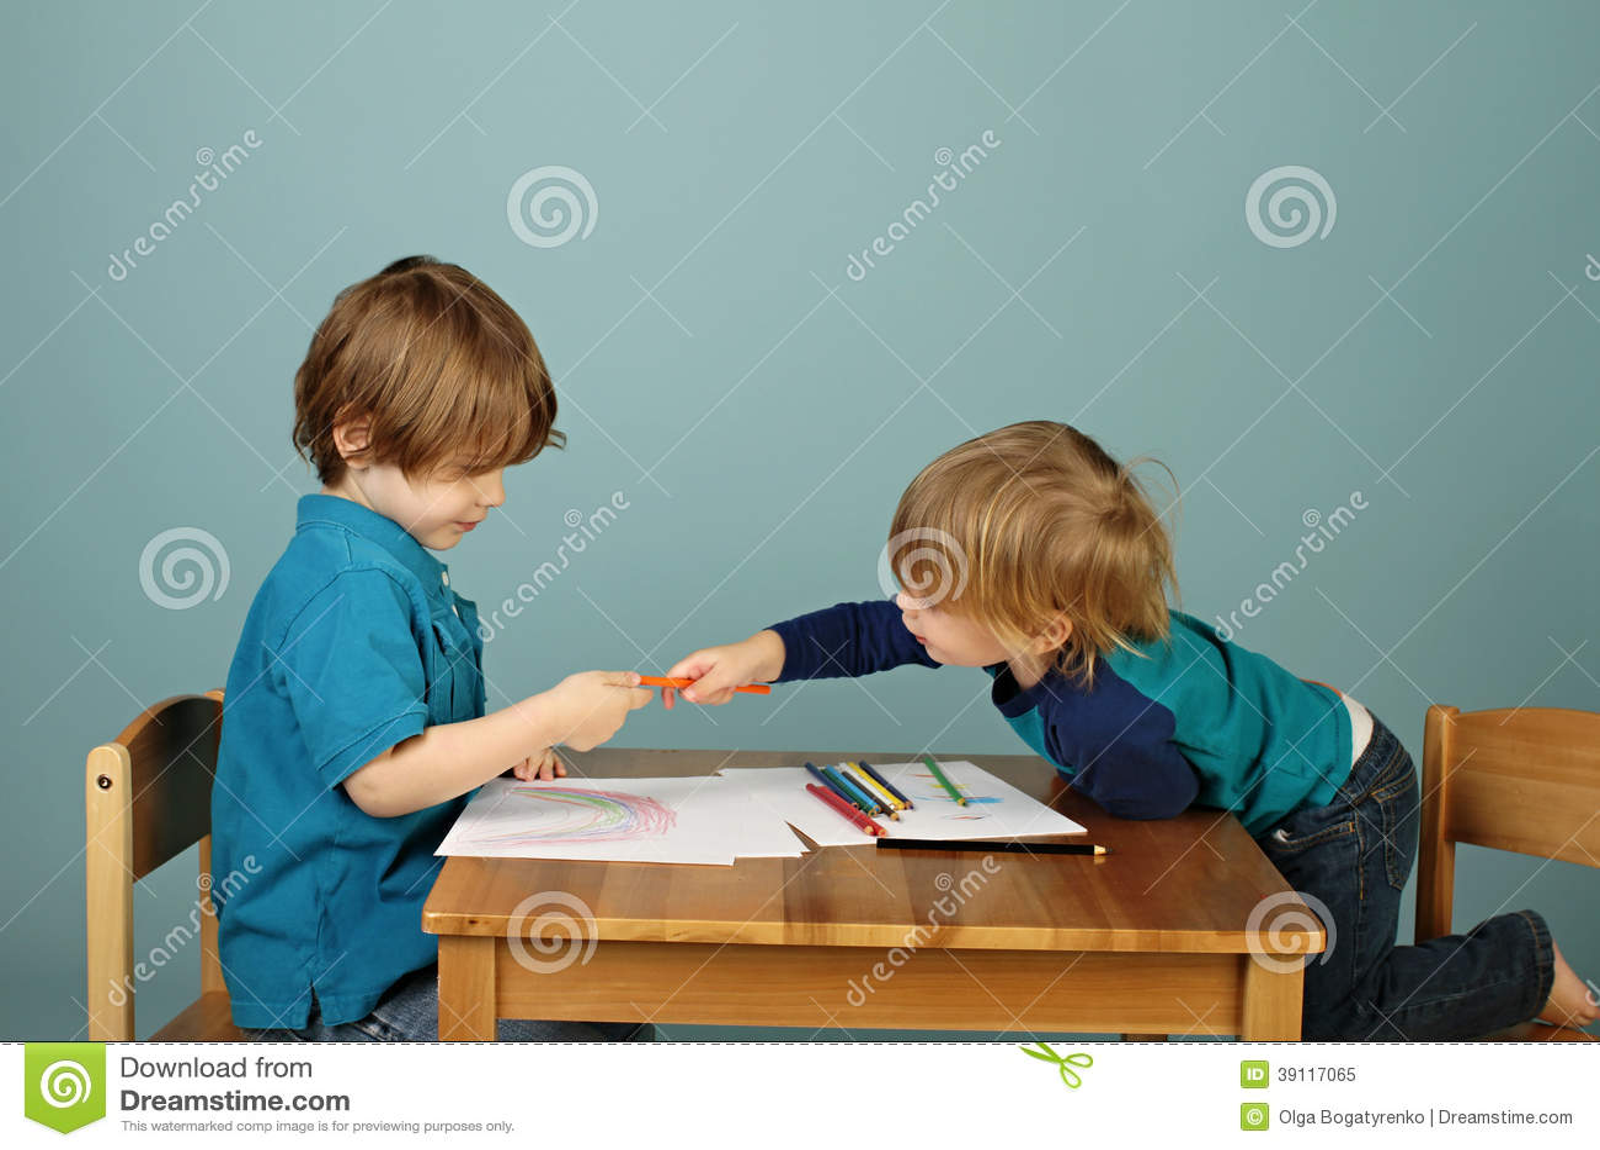 preschool learning alliance training preschool education stock image image of school 216